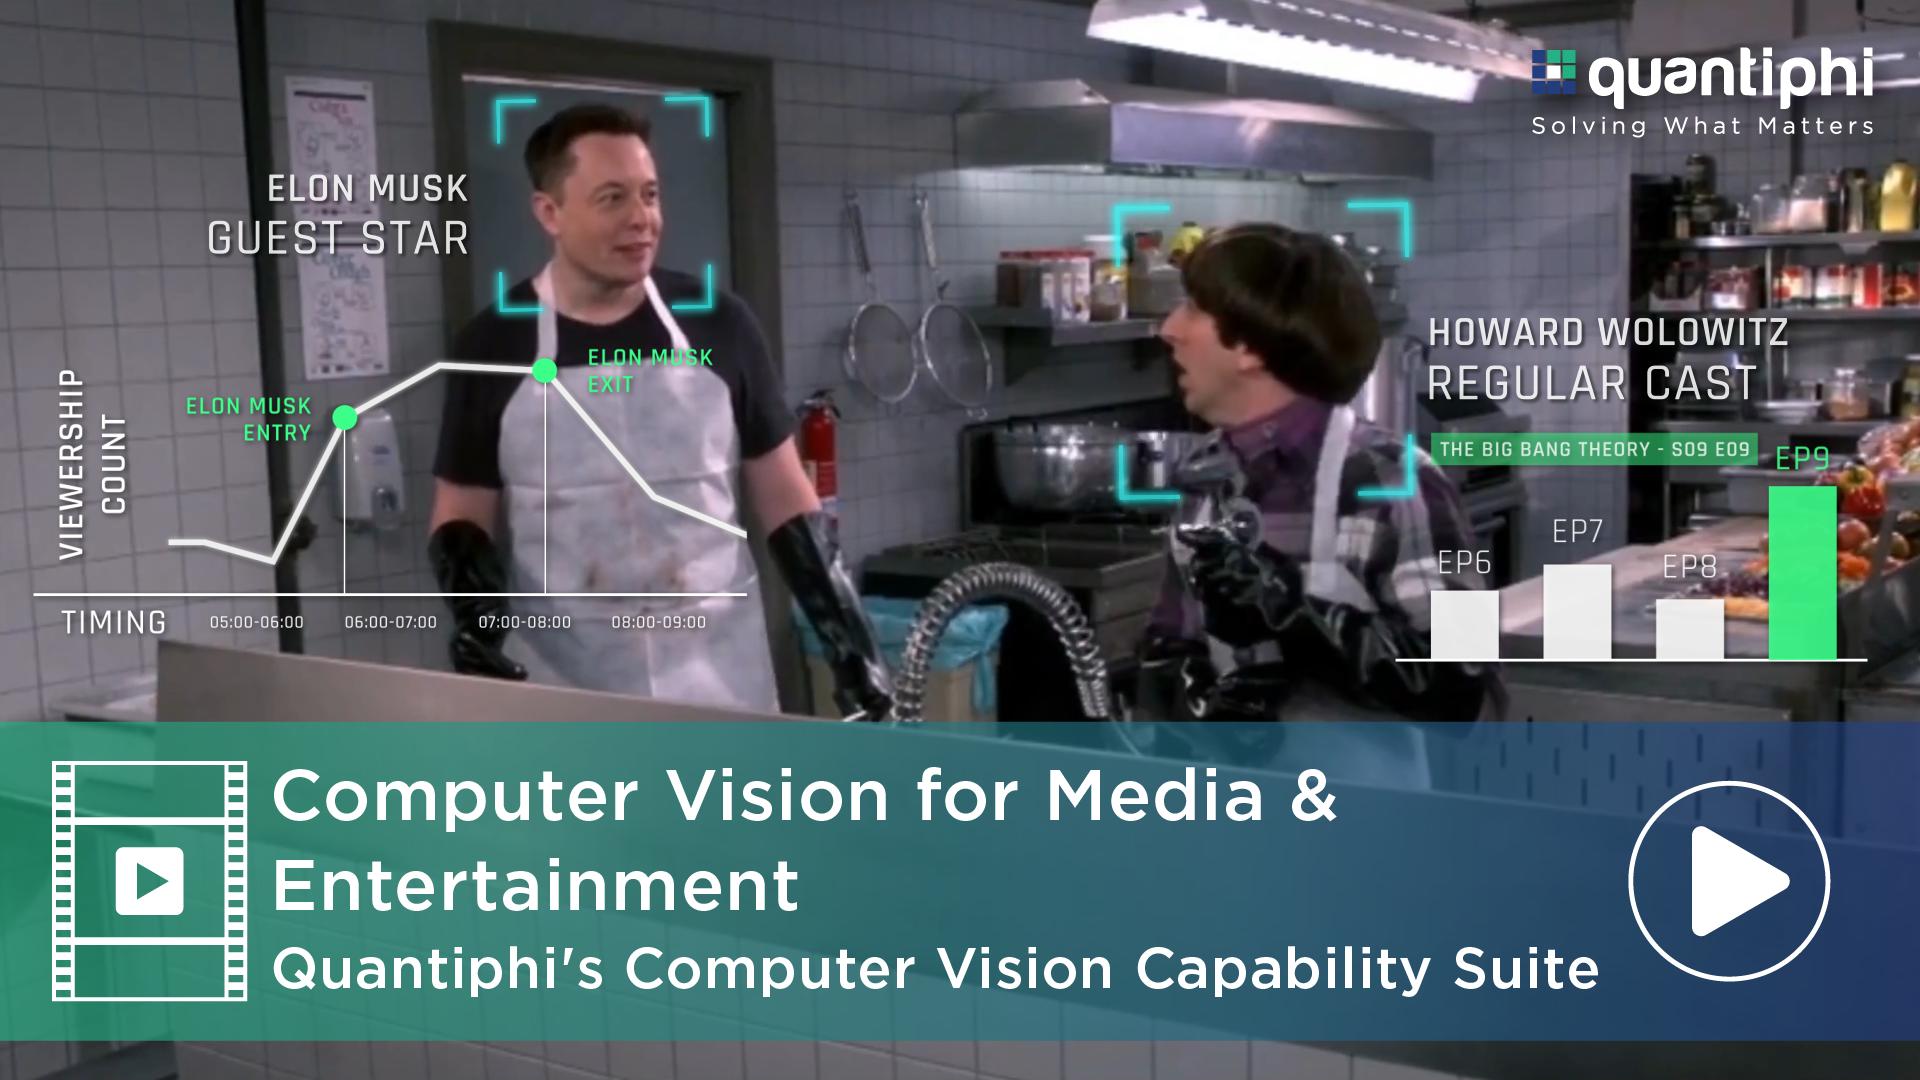 Computer Vision_Media & Entertainment-1